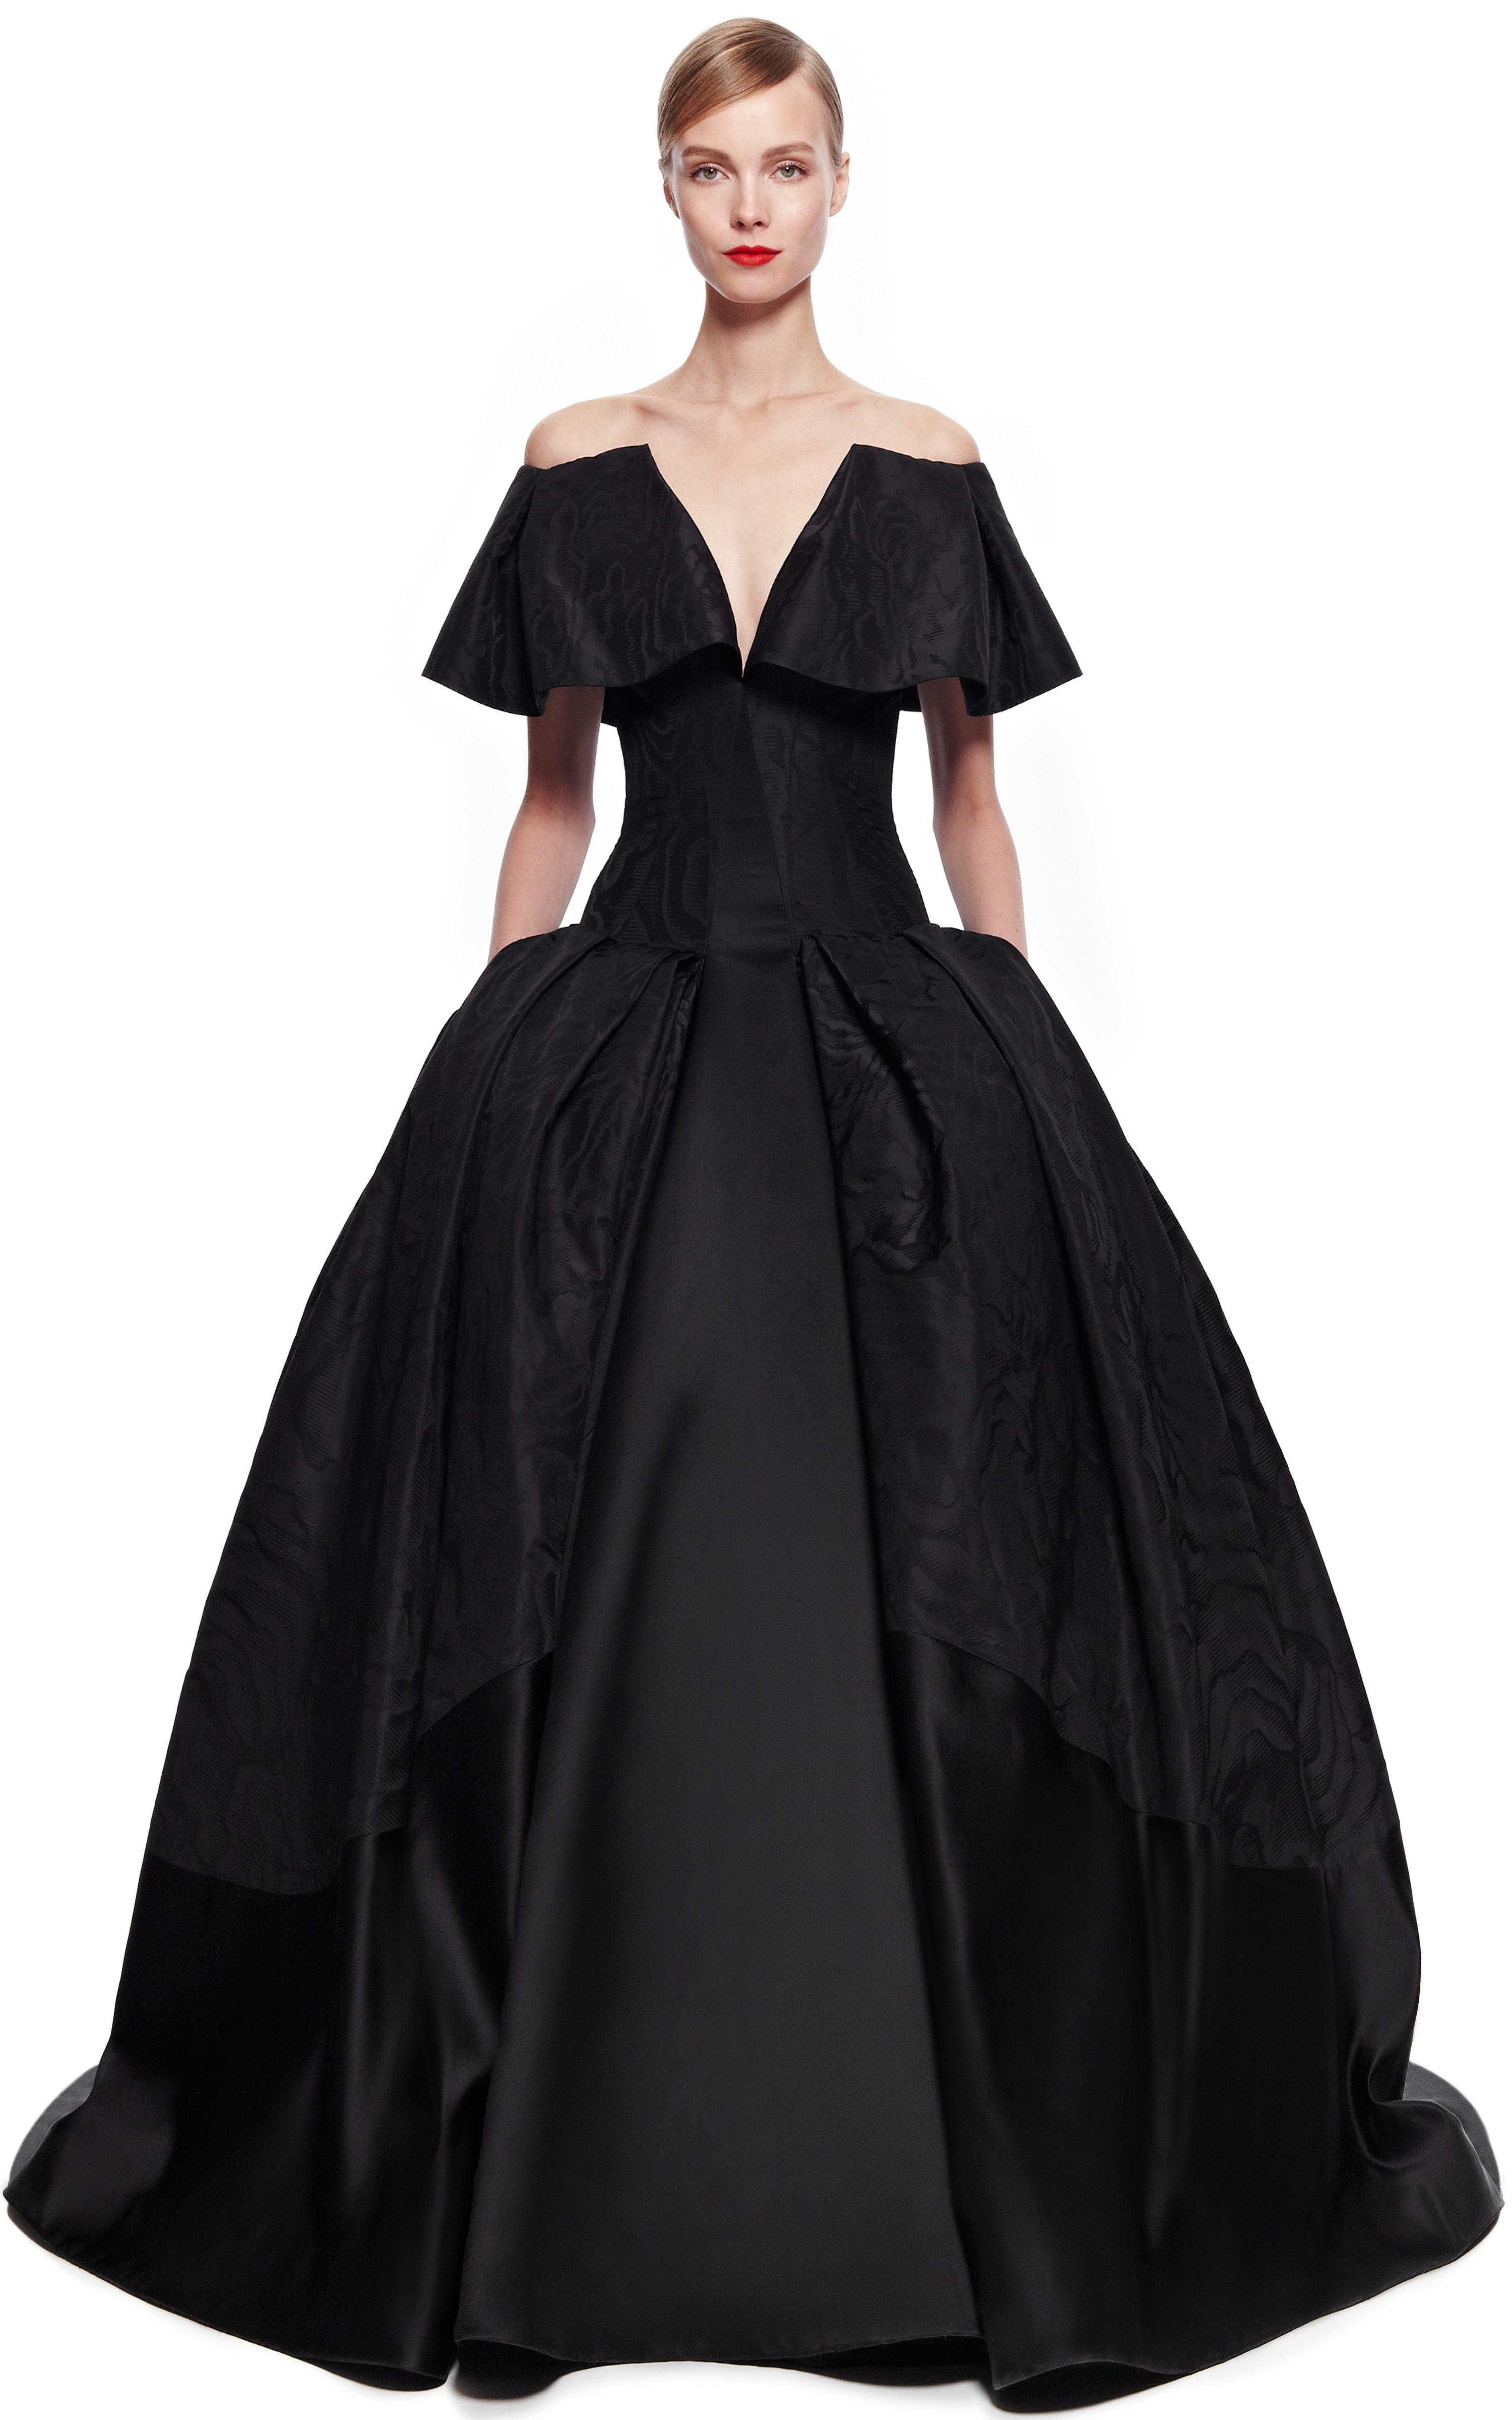 Zac Posen Taffeta Jacquard Gown In Black Lyst